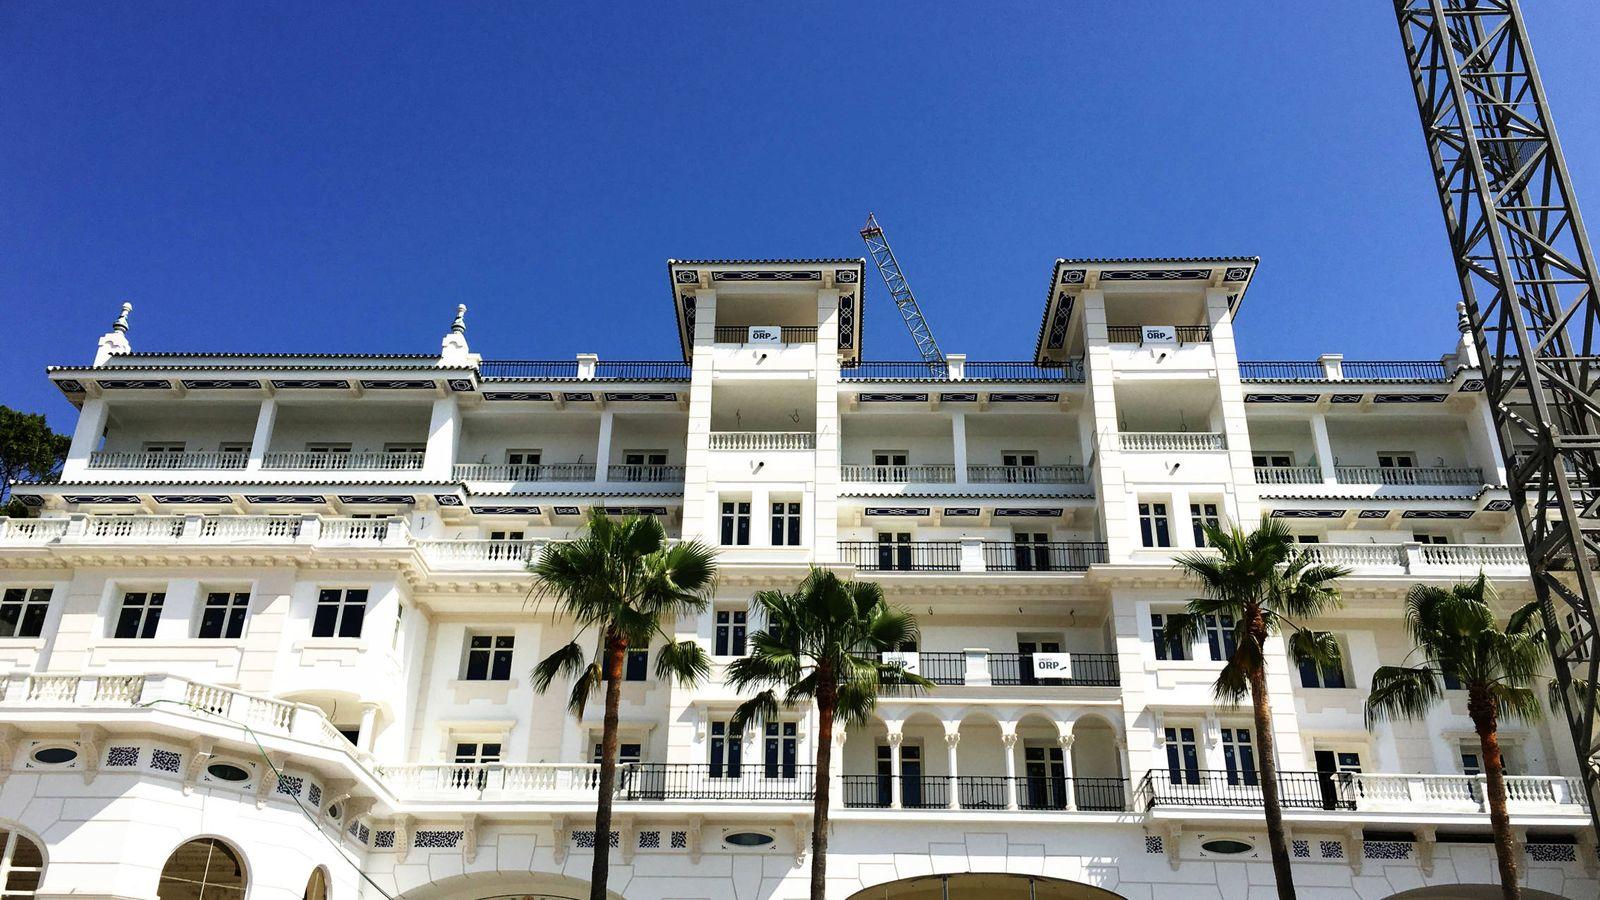 Noticias de andaluc a sequ a de hoteles cinco estrellas for Listado hoteles 5 estrellas madrid